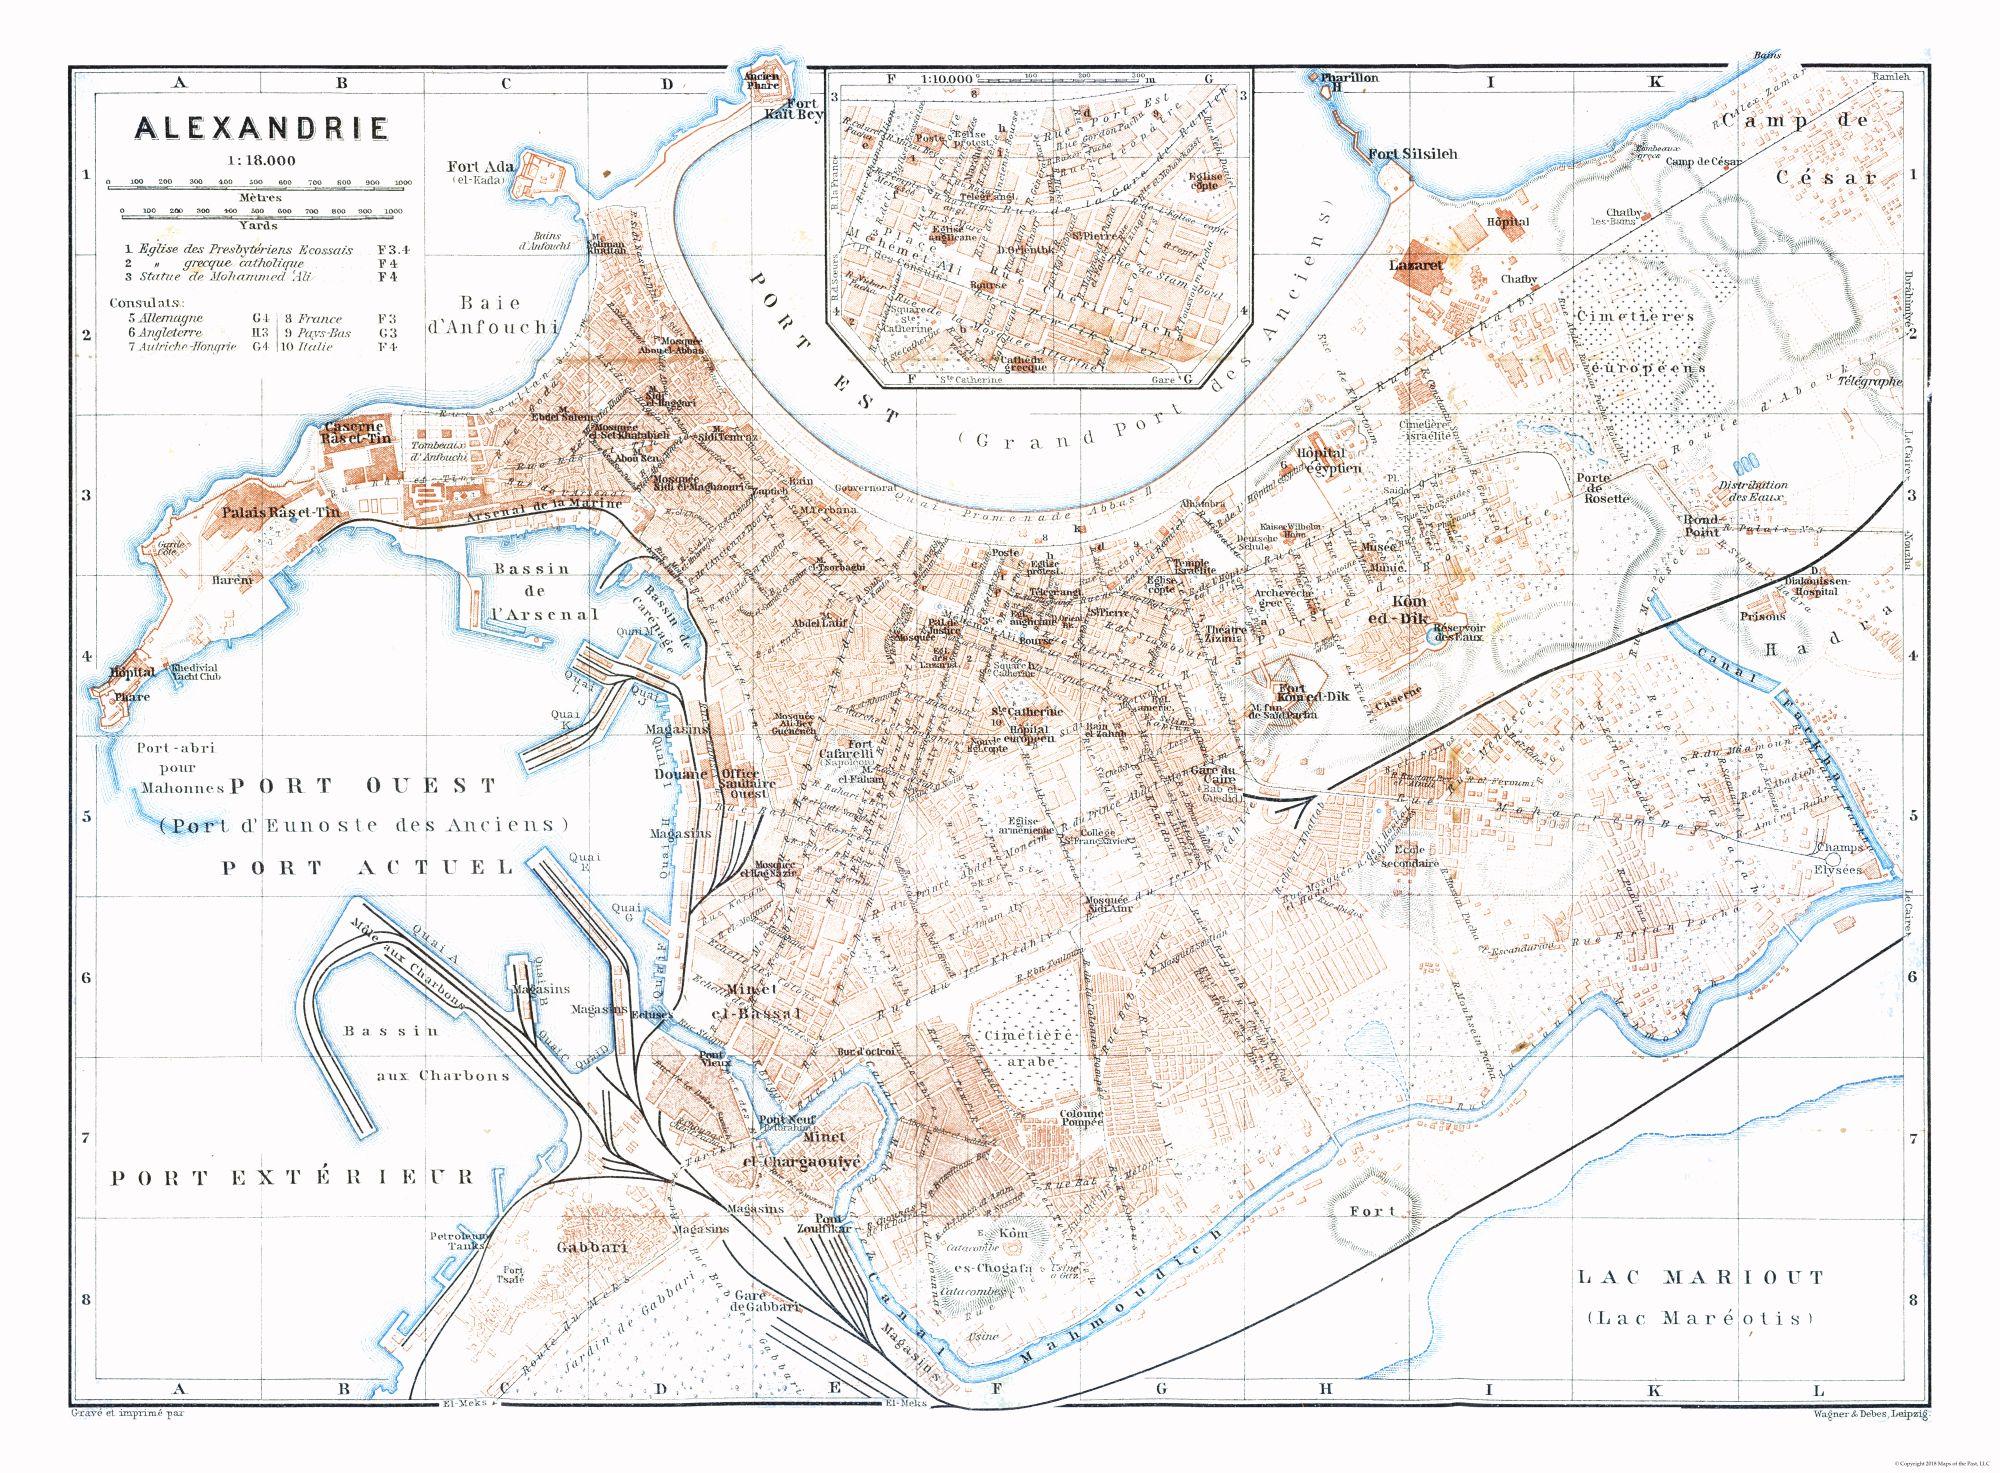 Old International Maps Alexandria Egypt Baedeker 1913 31 22 X 23